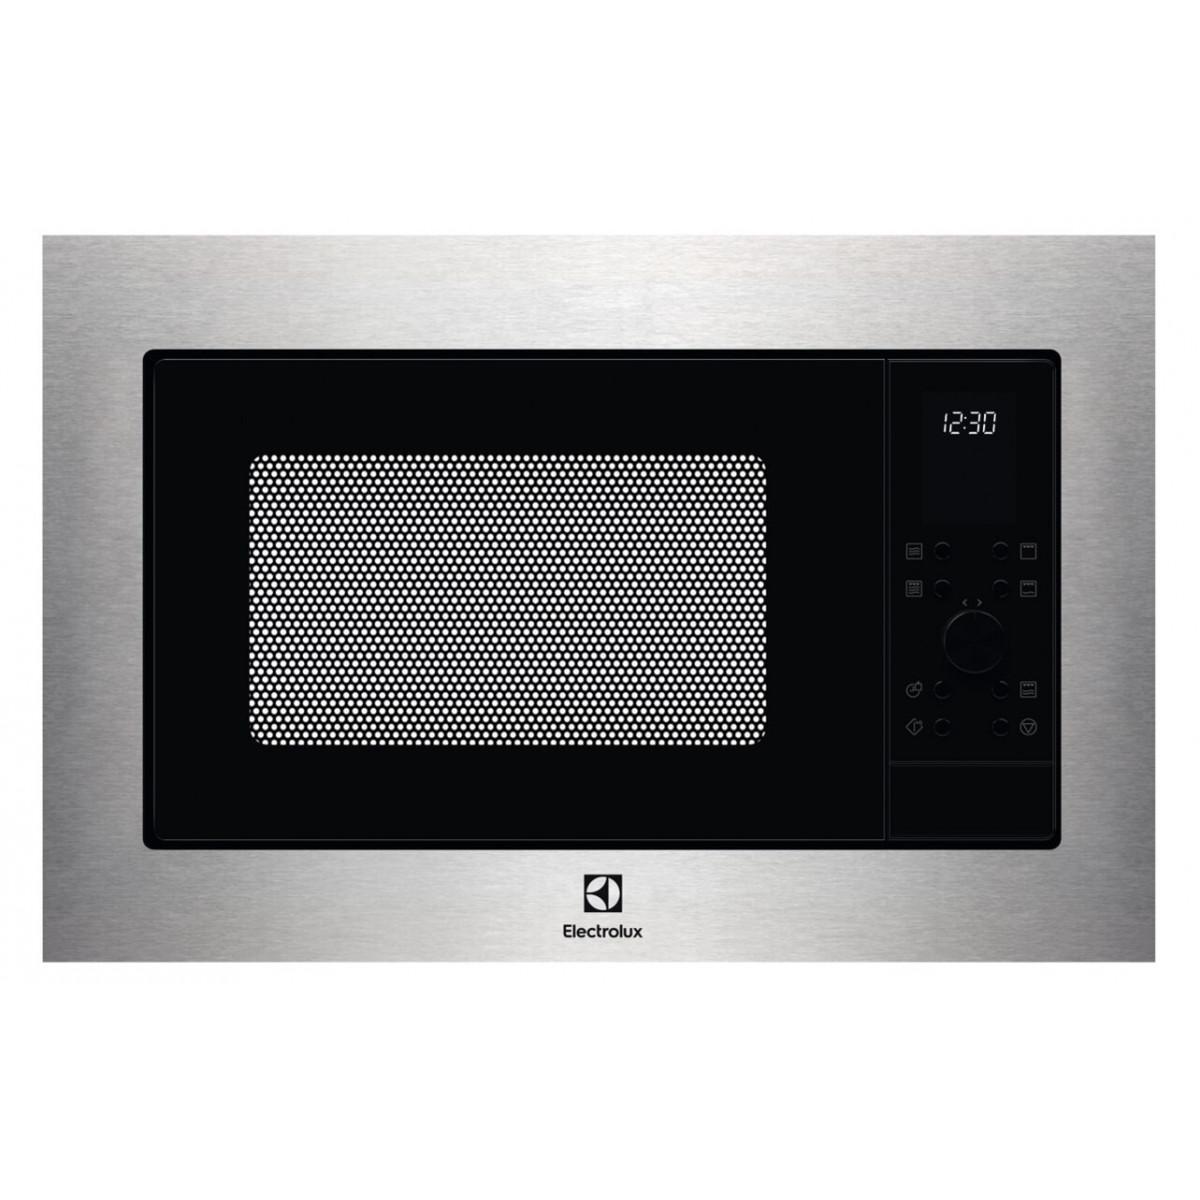 Electrolux Micro-ondes Encastrable 25l Electrolux 1000w, Cms4253emx